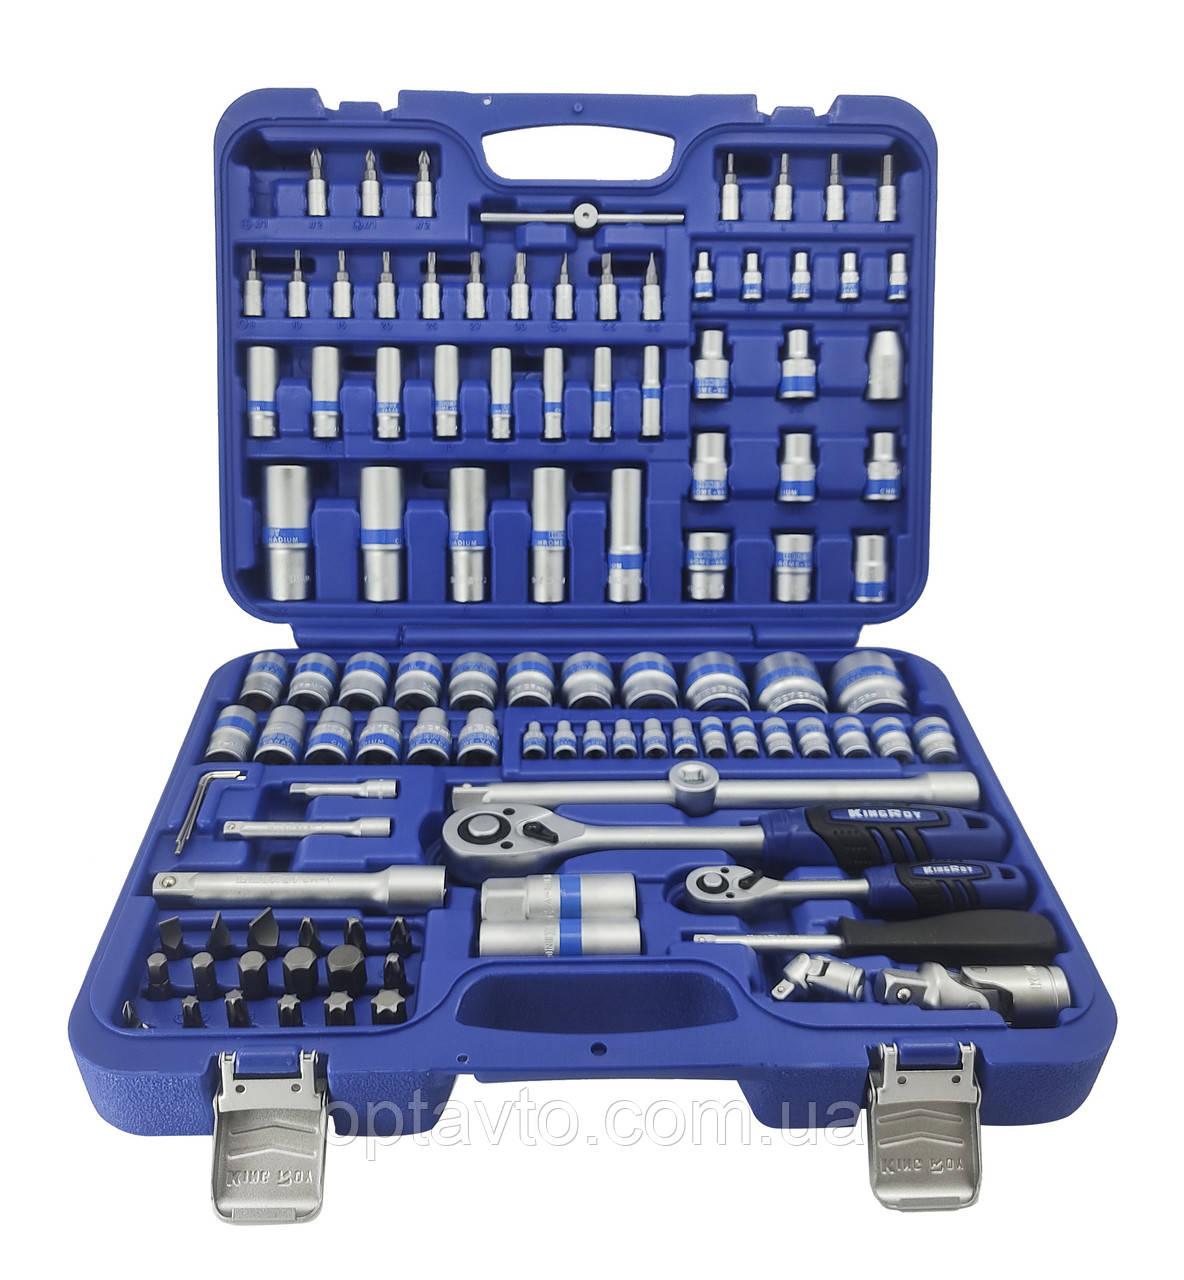 Набор инструментов 108 предметов MDA 6 King Roy. Супер качество!